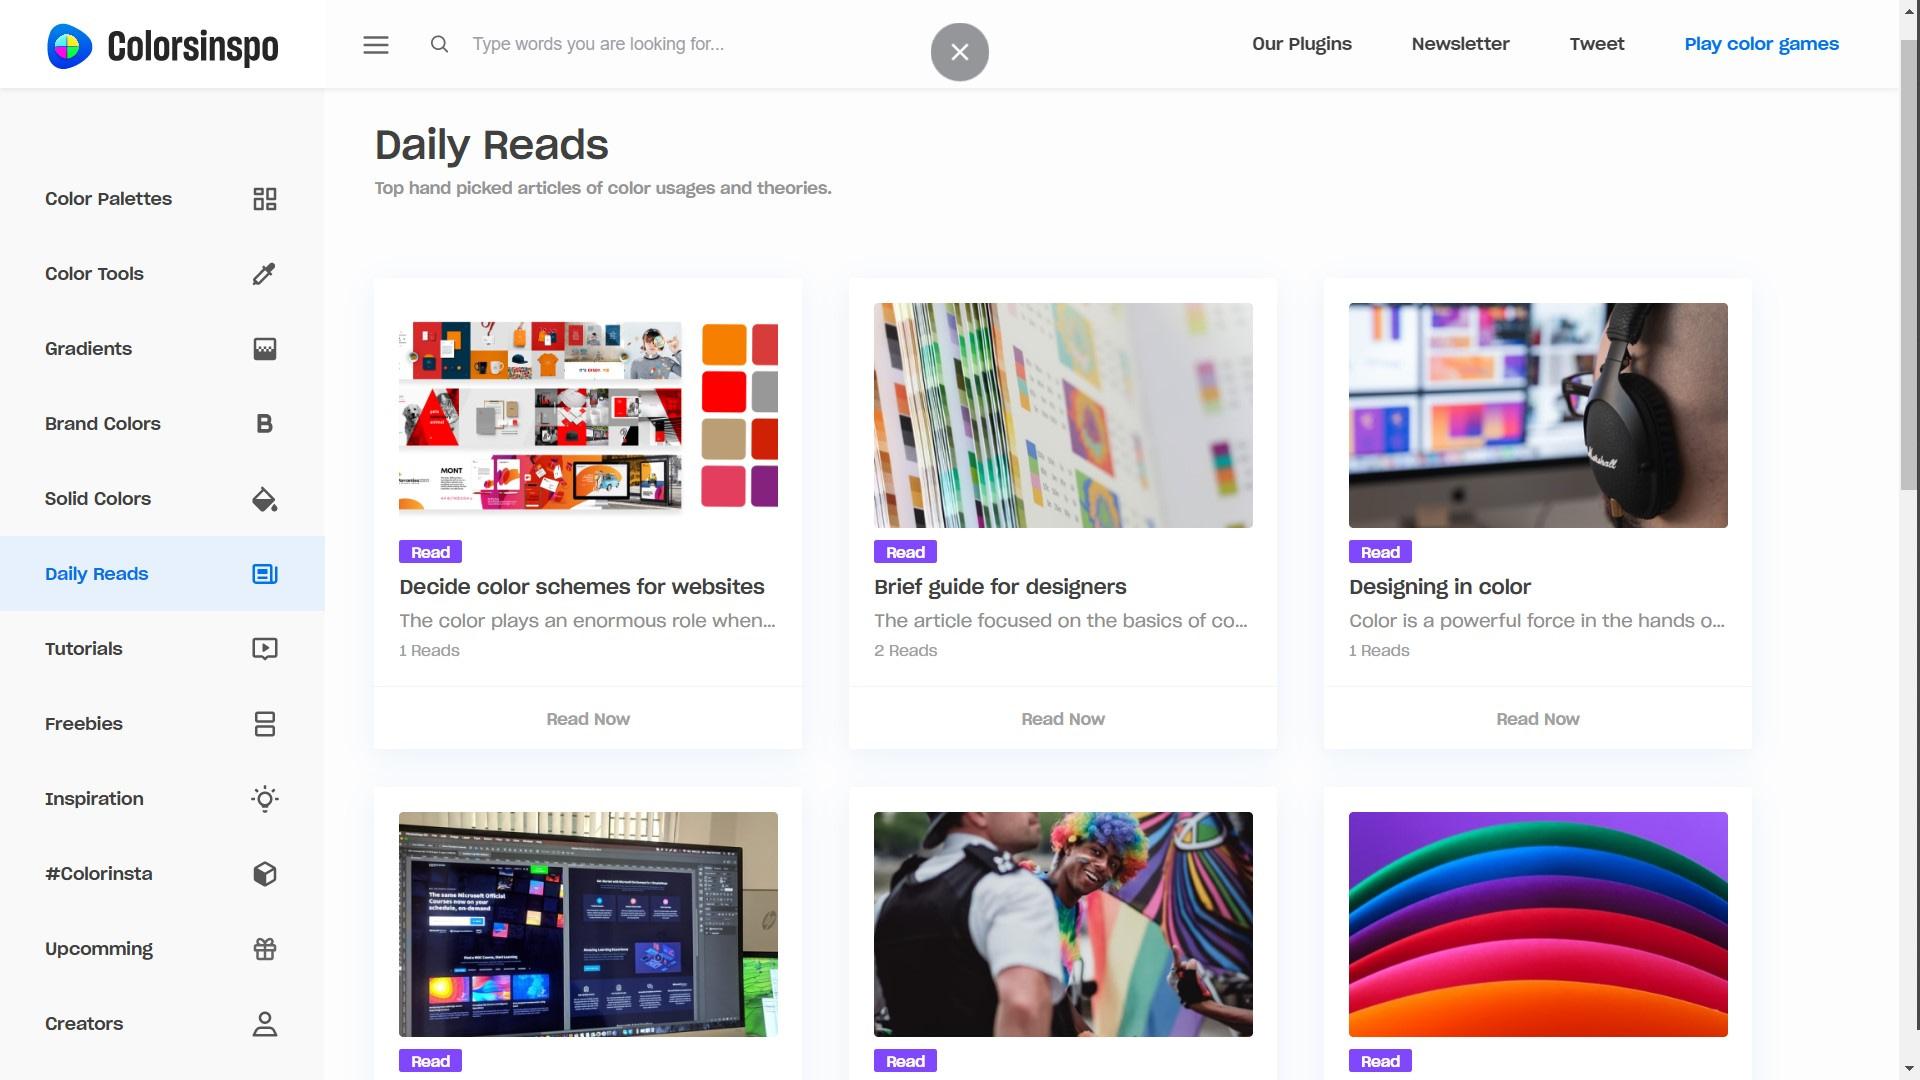 Colorsinspo - DailyReads Screenshot